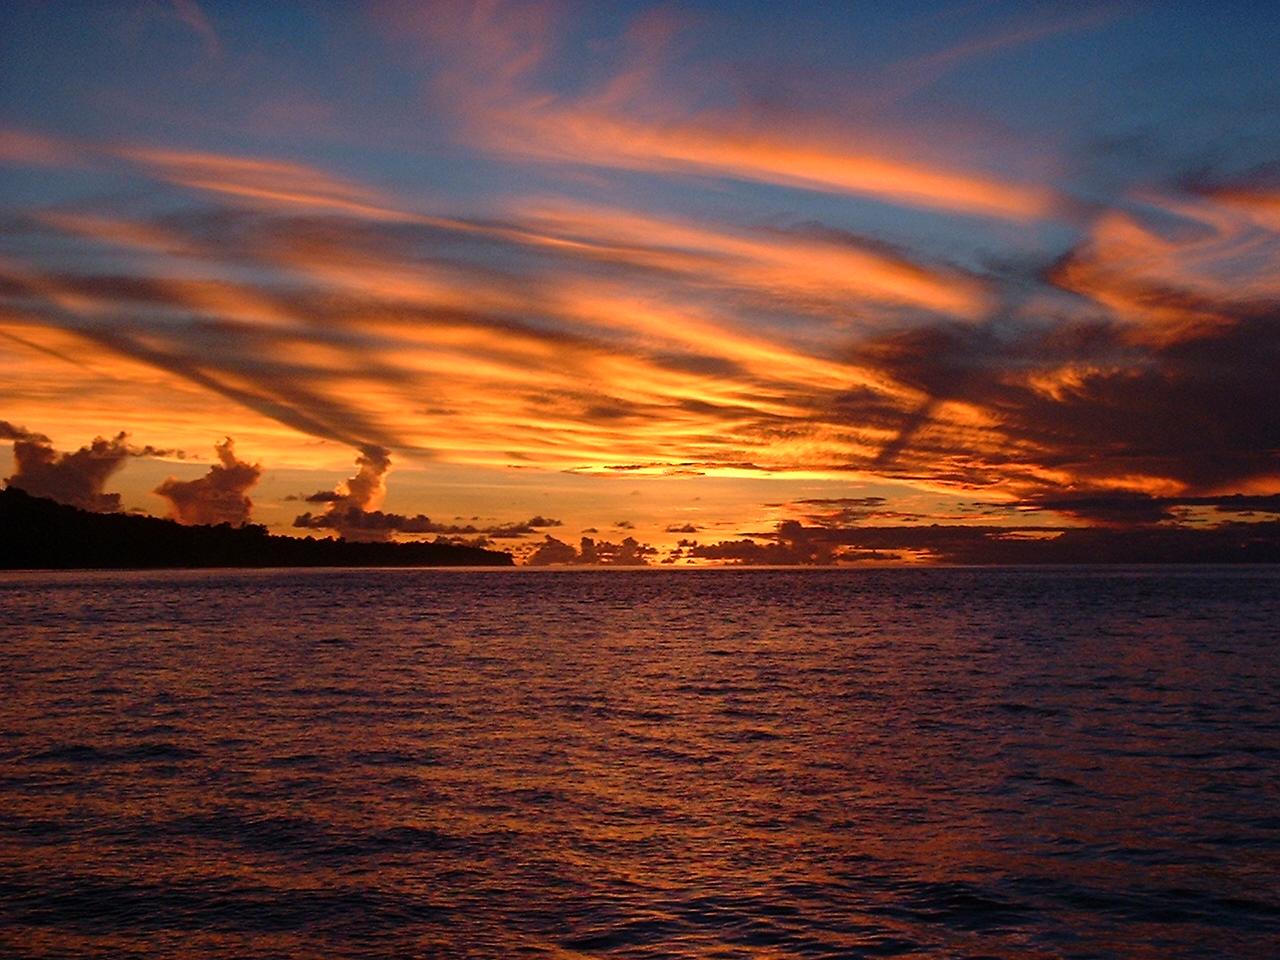 photo: Andy Bruner, shipboard sunset, Solomon Islands, 2002